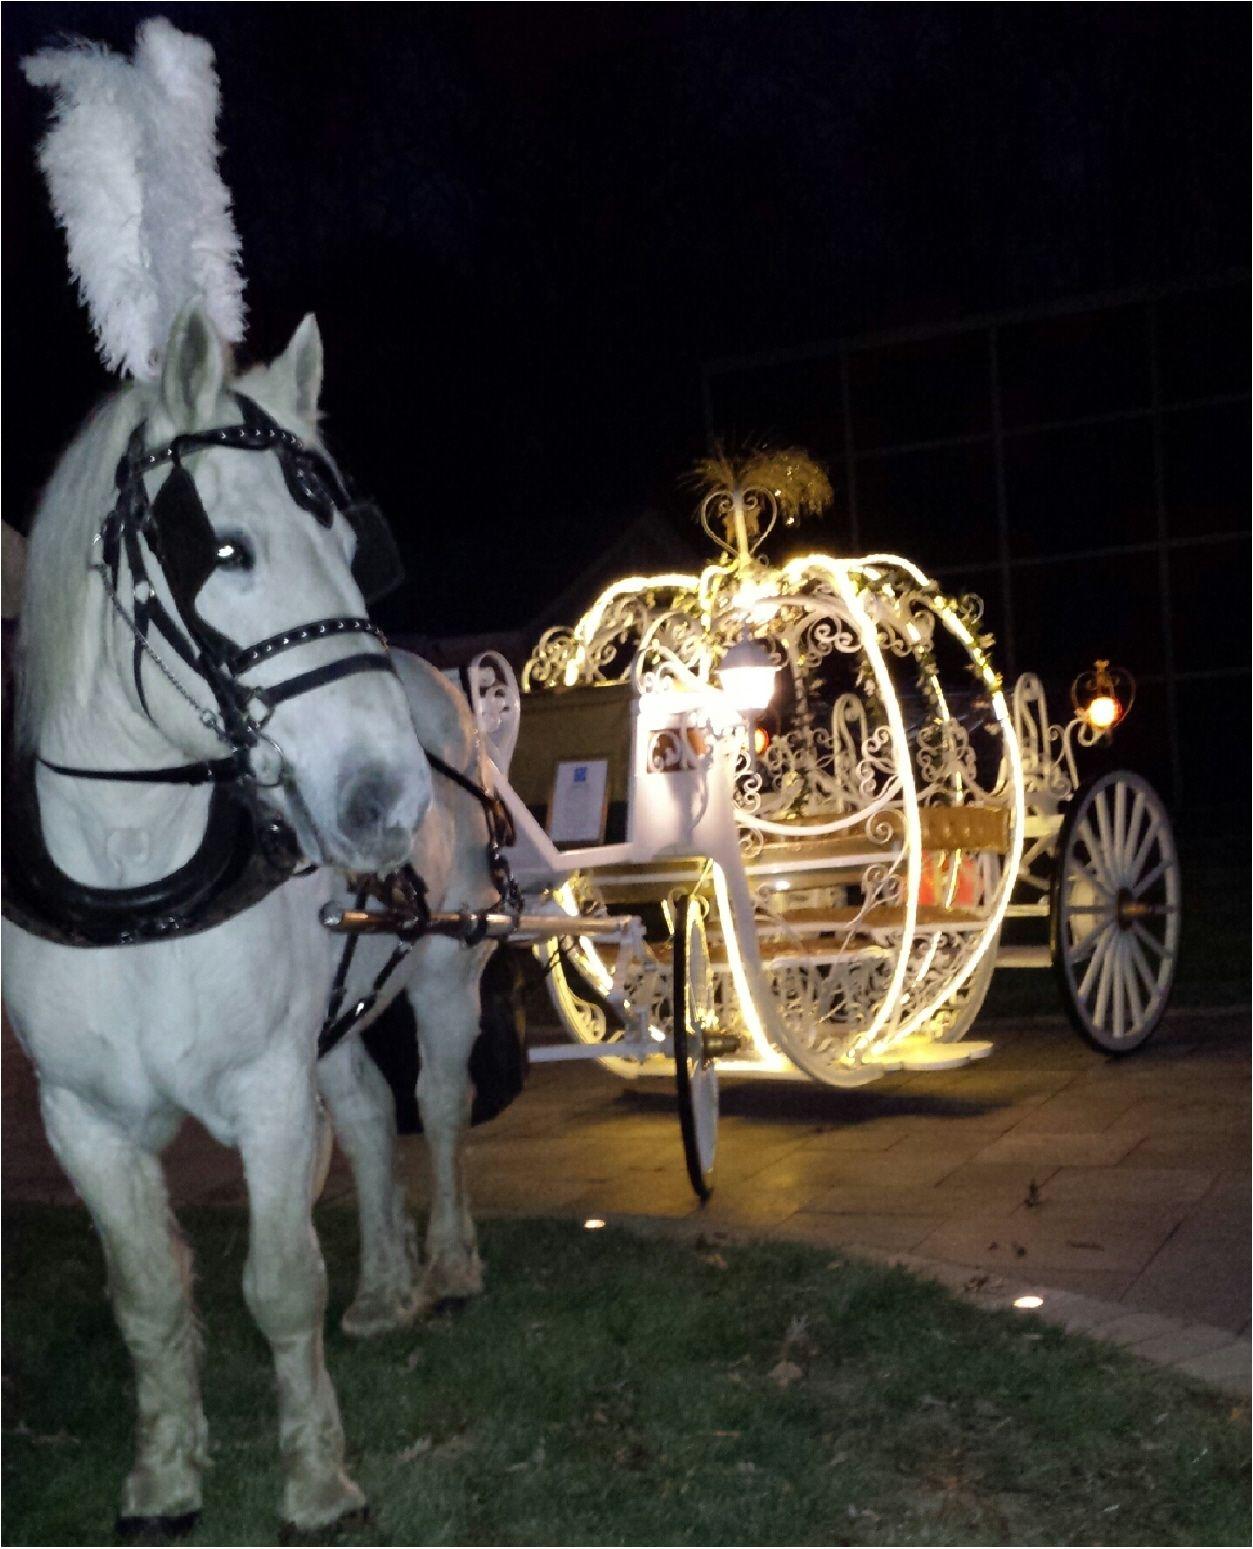 Cinderella Pumpkin Carriage All Lit Up Last Night At Crystal Manor Wedding Glassboro N Cinderella Pumpkin Carriage Horse And Carriage Wedding Wedding Carriage